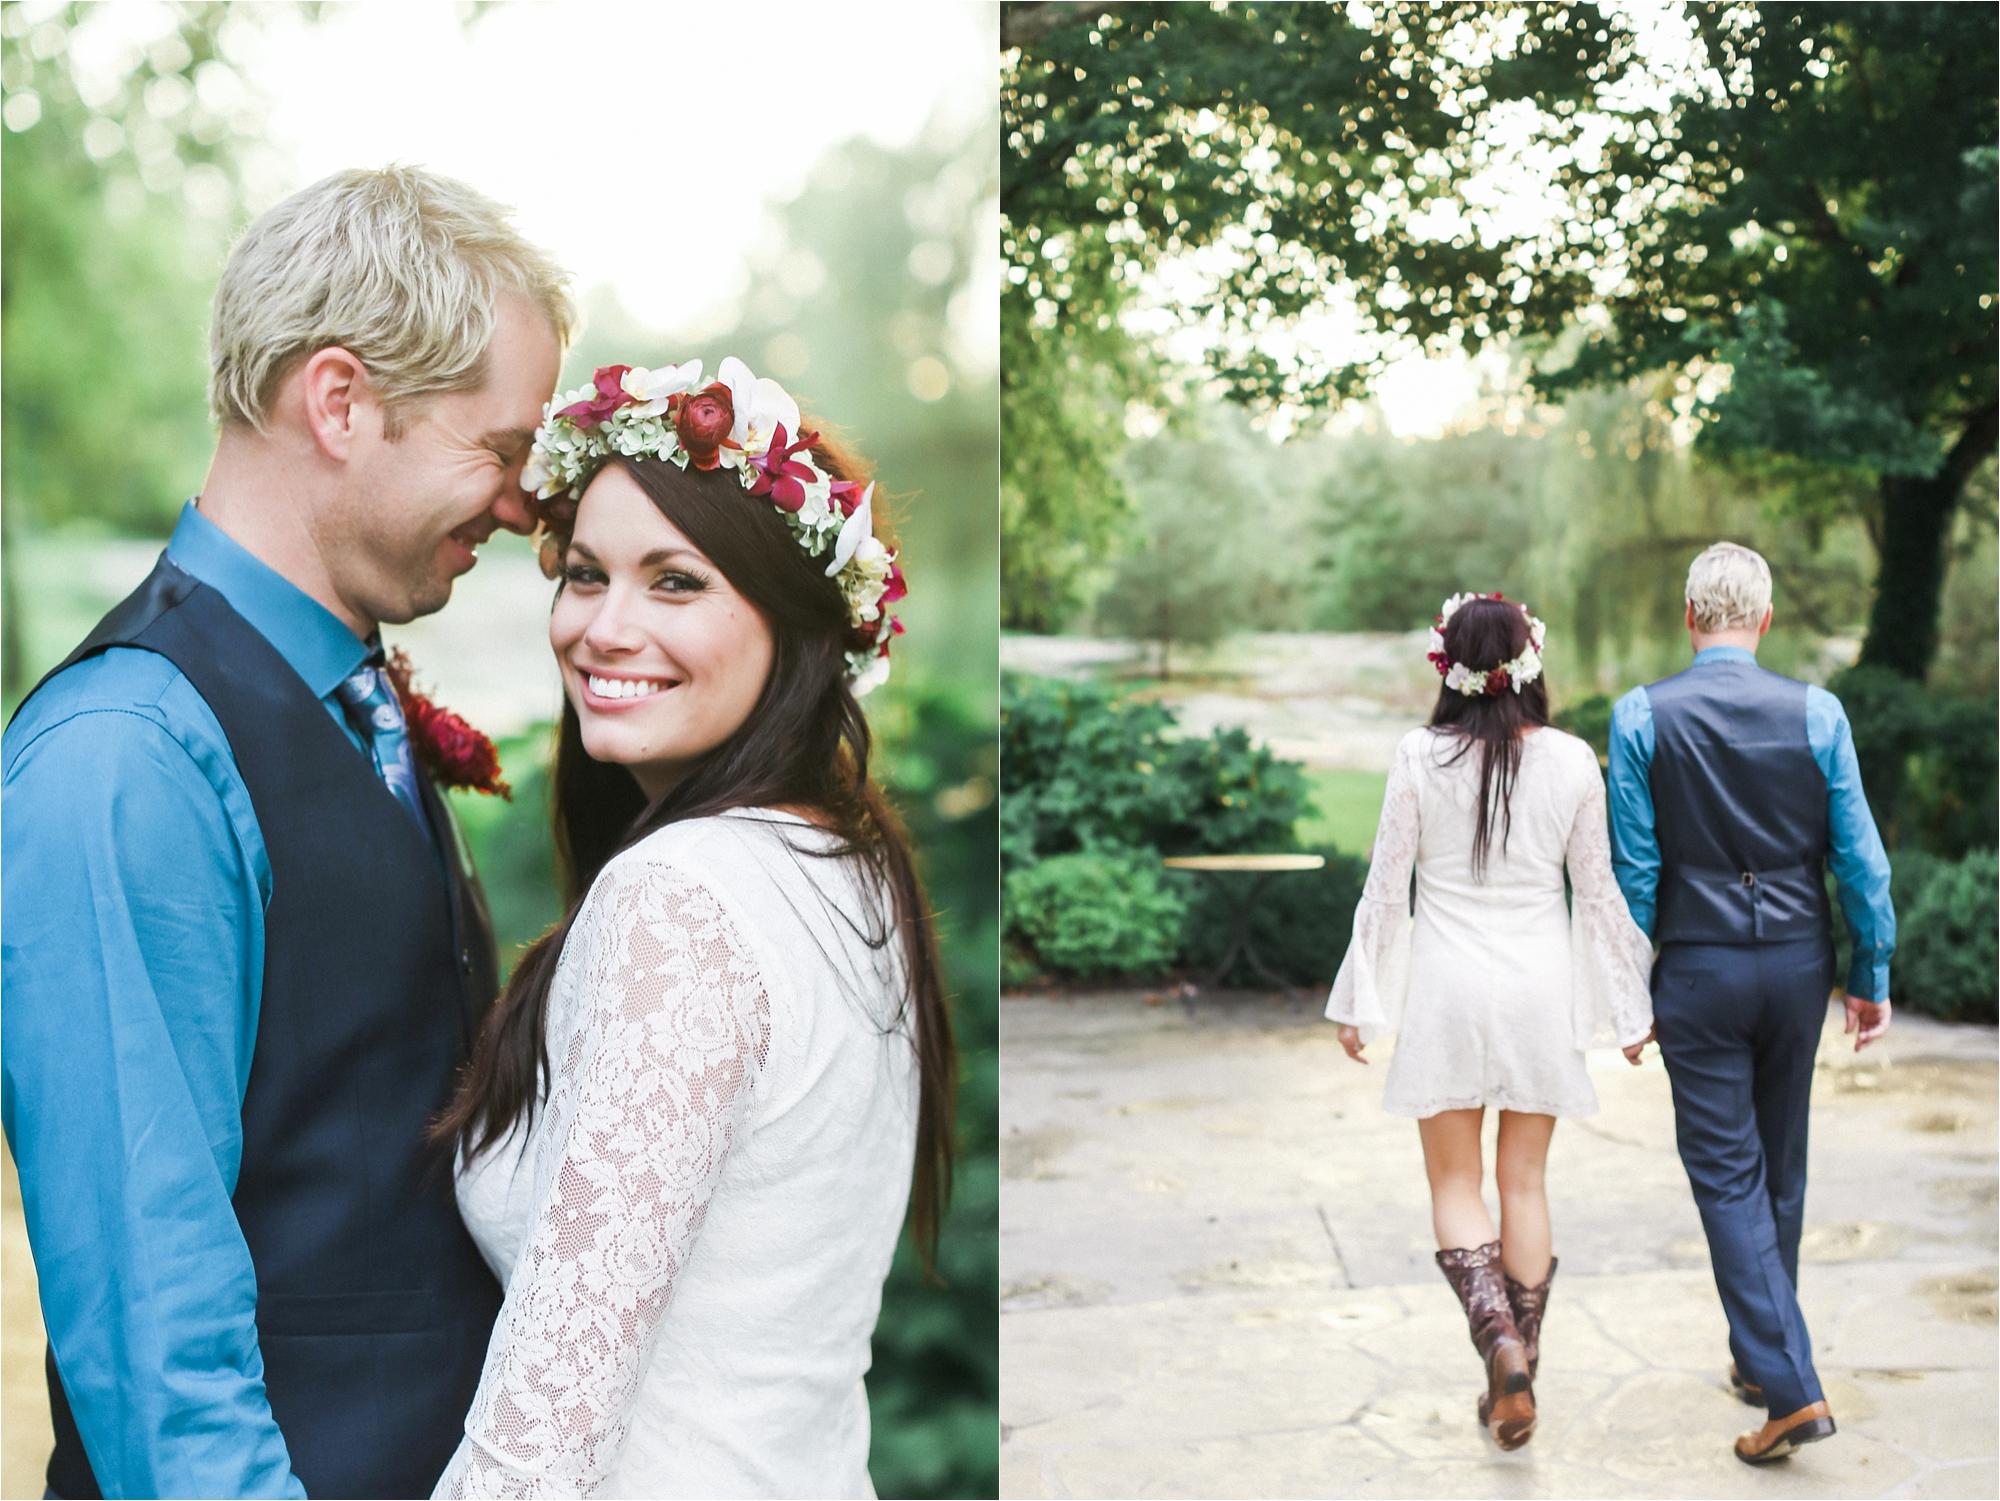 stephanie-yonce-photography-richmond-virginia-bohemian-outdoor-wedding-photo_0031.jpg